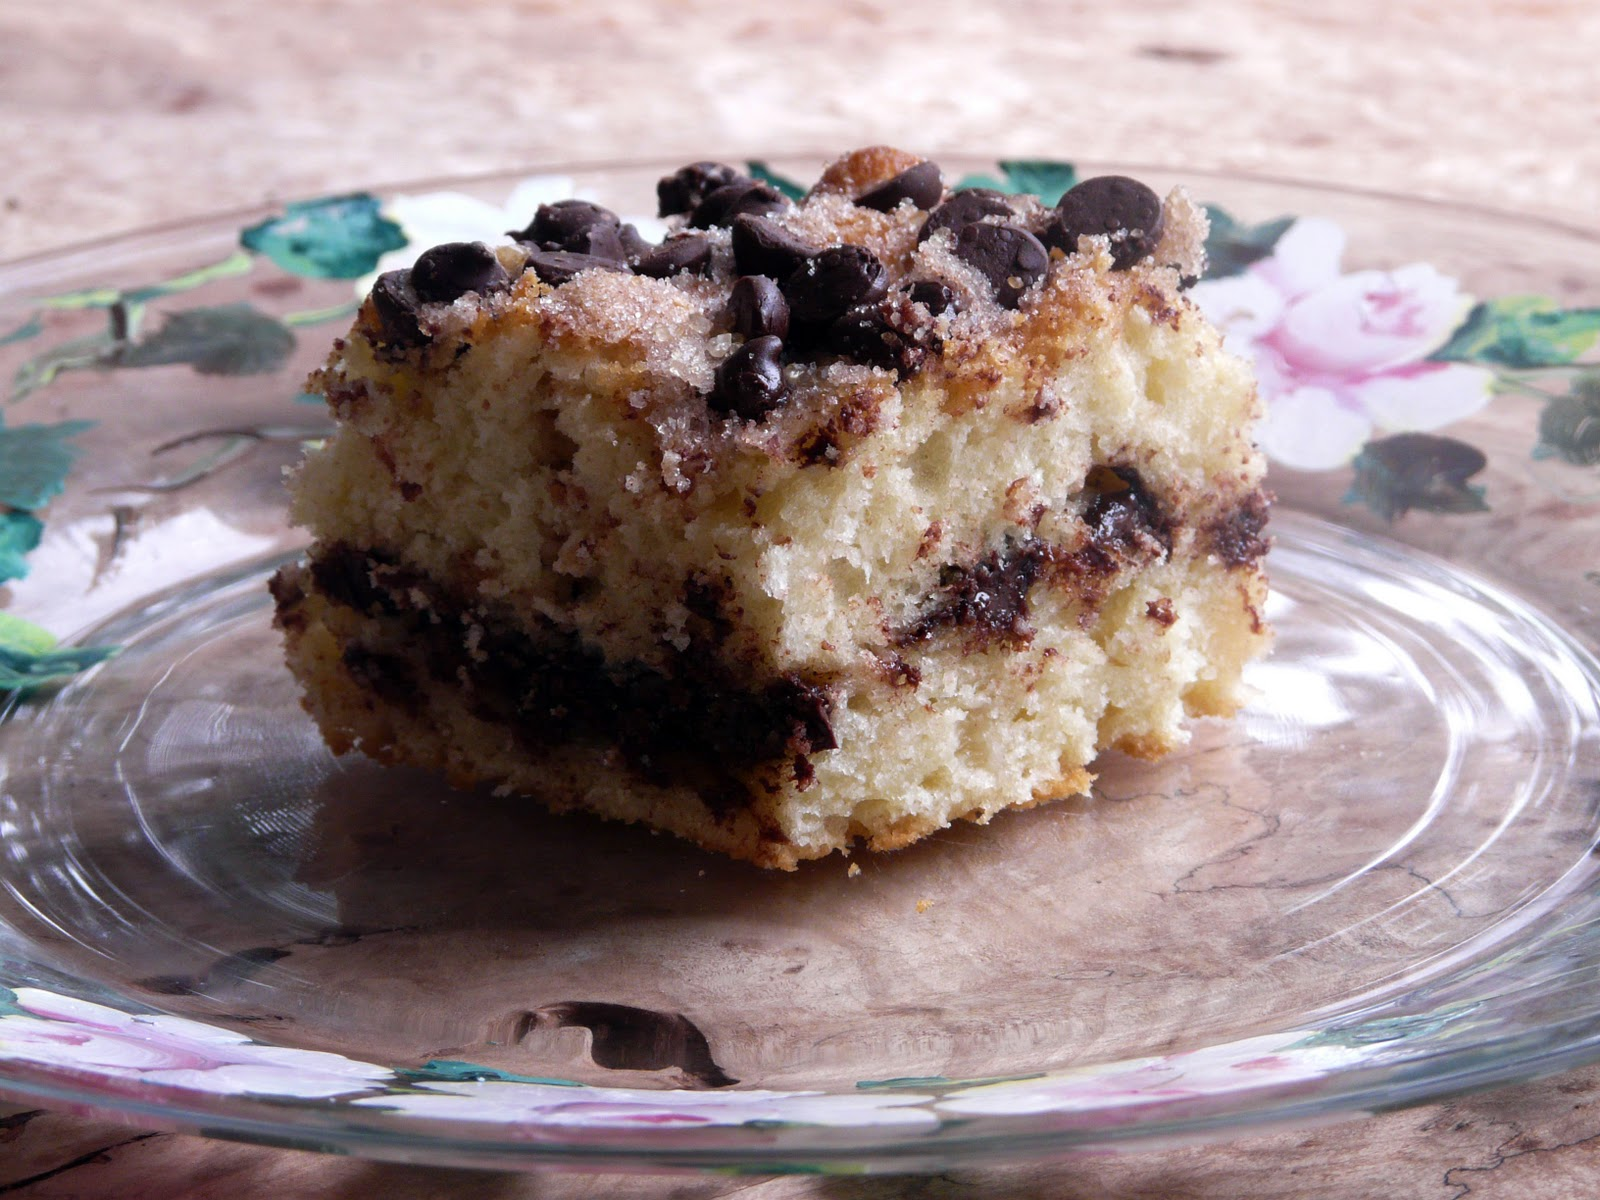 Chocolate chip sour cream coffee cake recipe